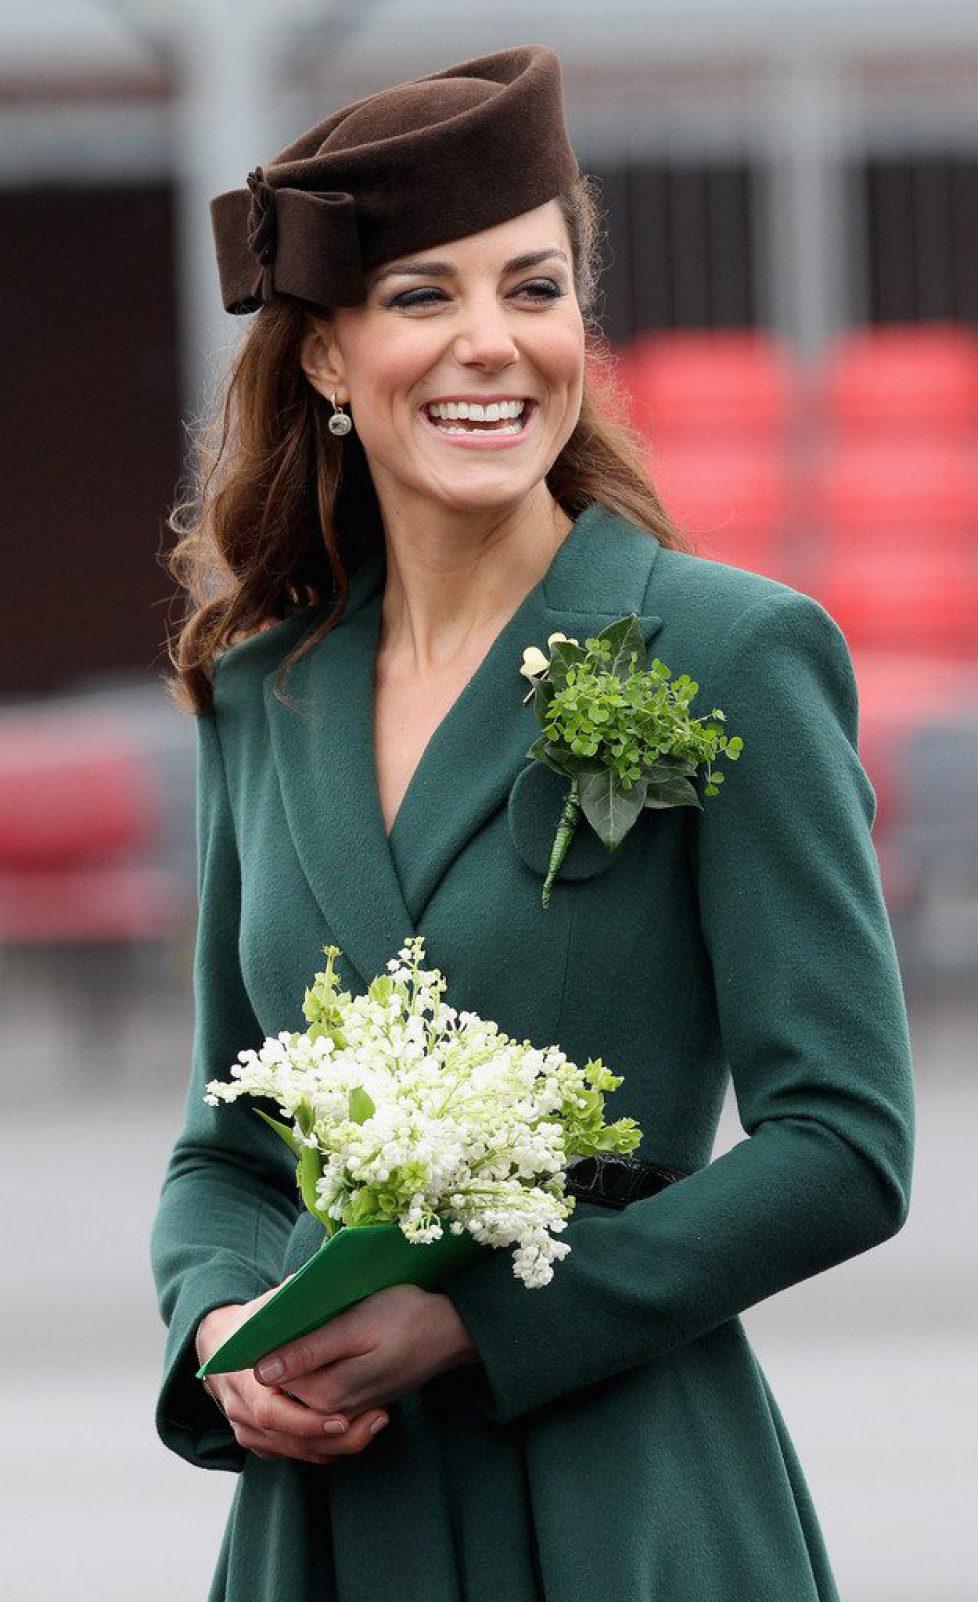 Duchess+Cambridge+Visits+Irish+Guards+Their+_1TGNi8Y4qTx